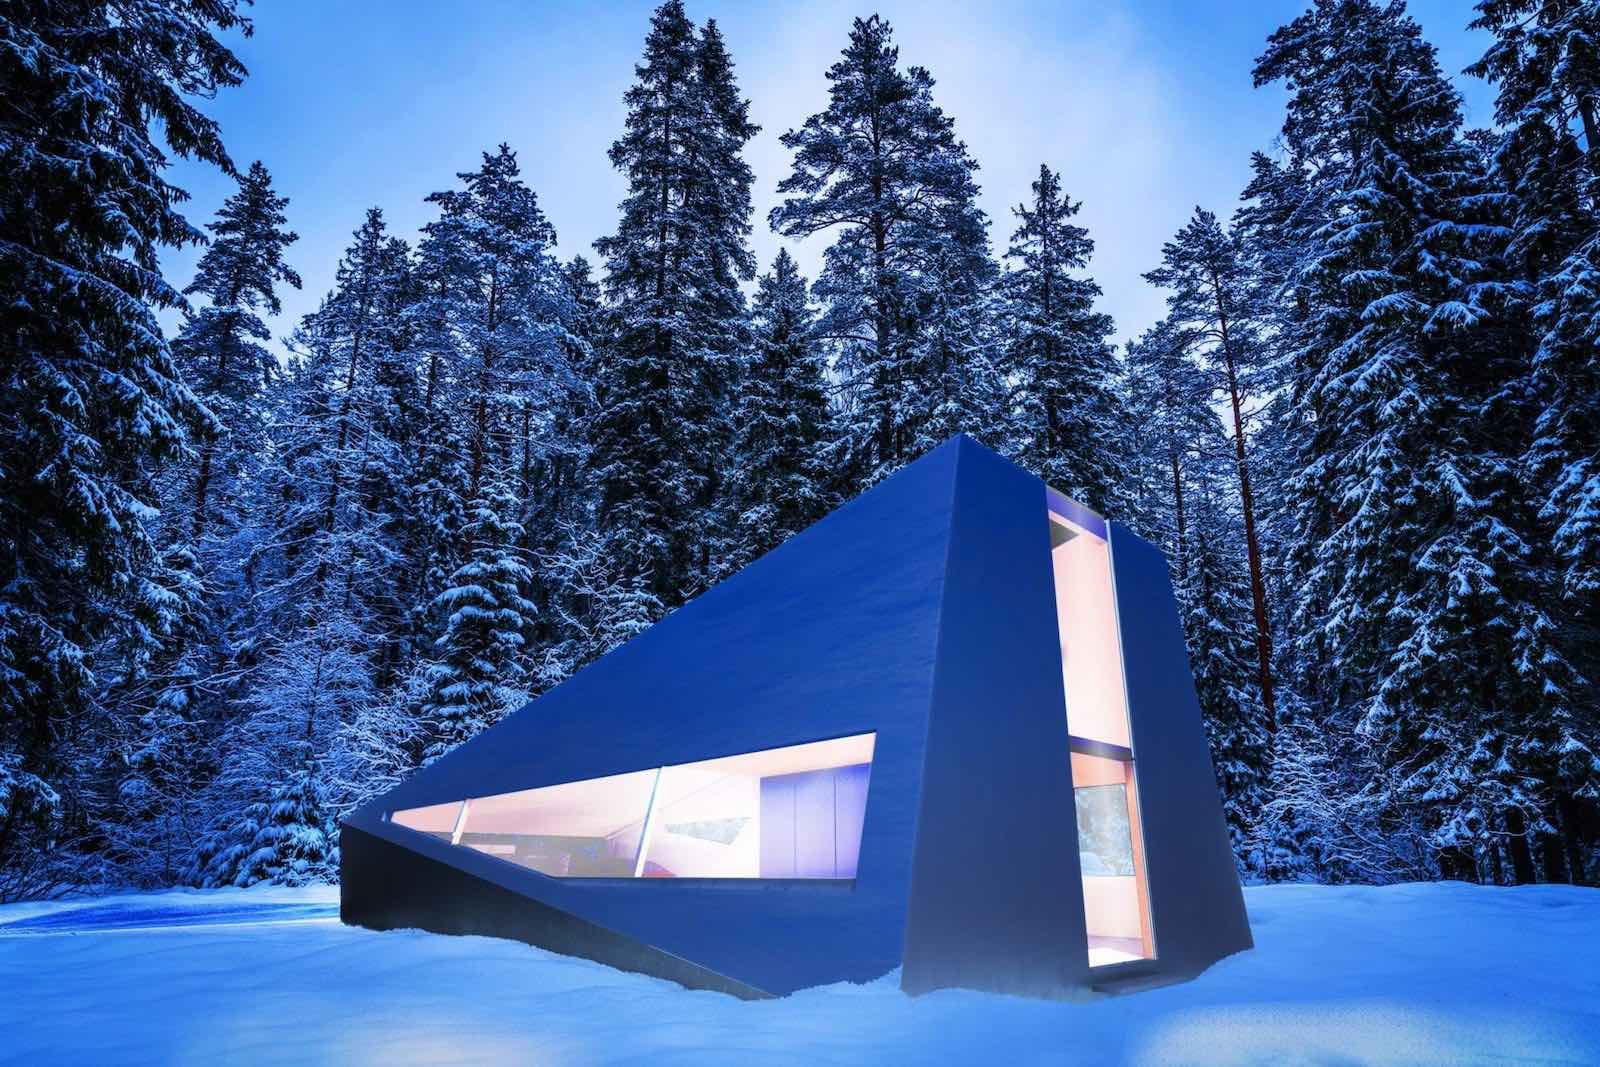 Concepto de garaje futurista y modular pro Lars Büro.